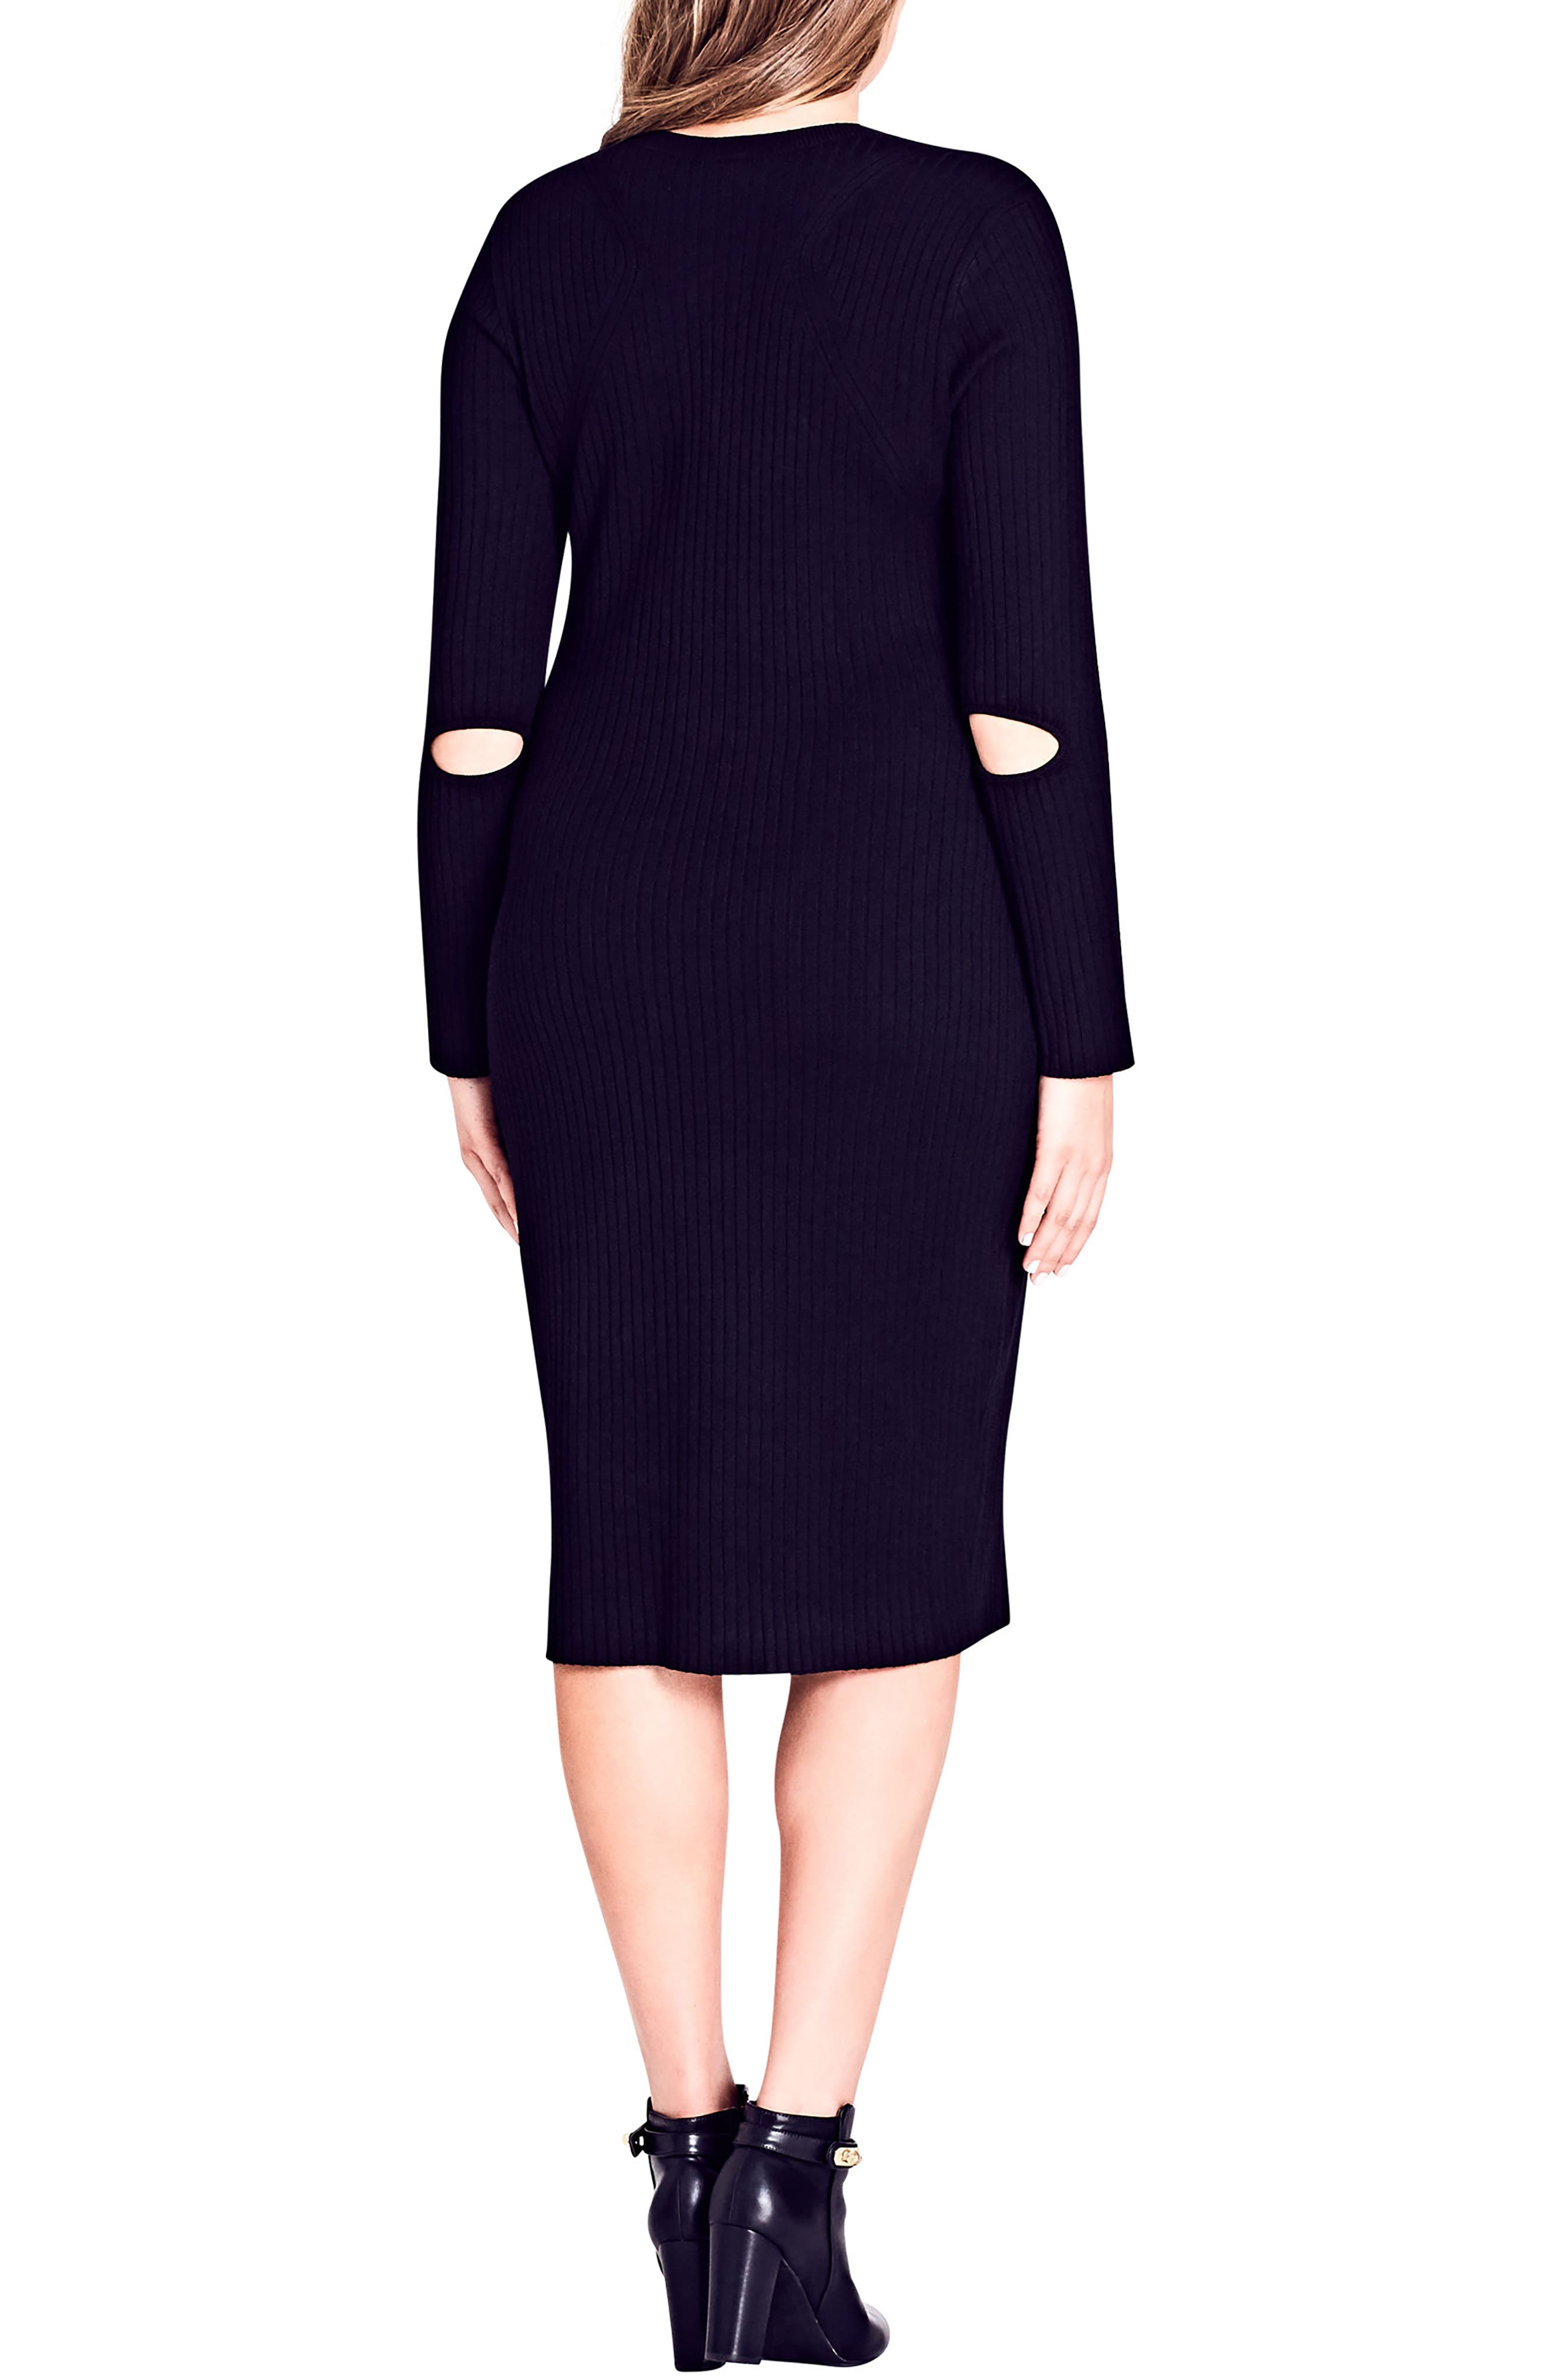 Zipped Up Sweater Dress,                             Alternate thumbnail 2, color,                             Black